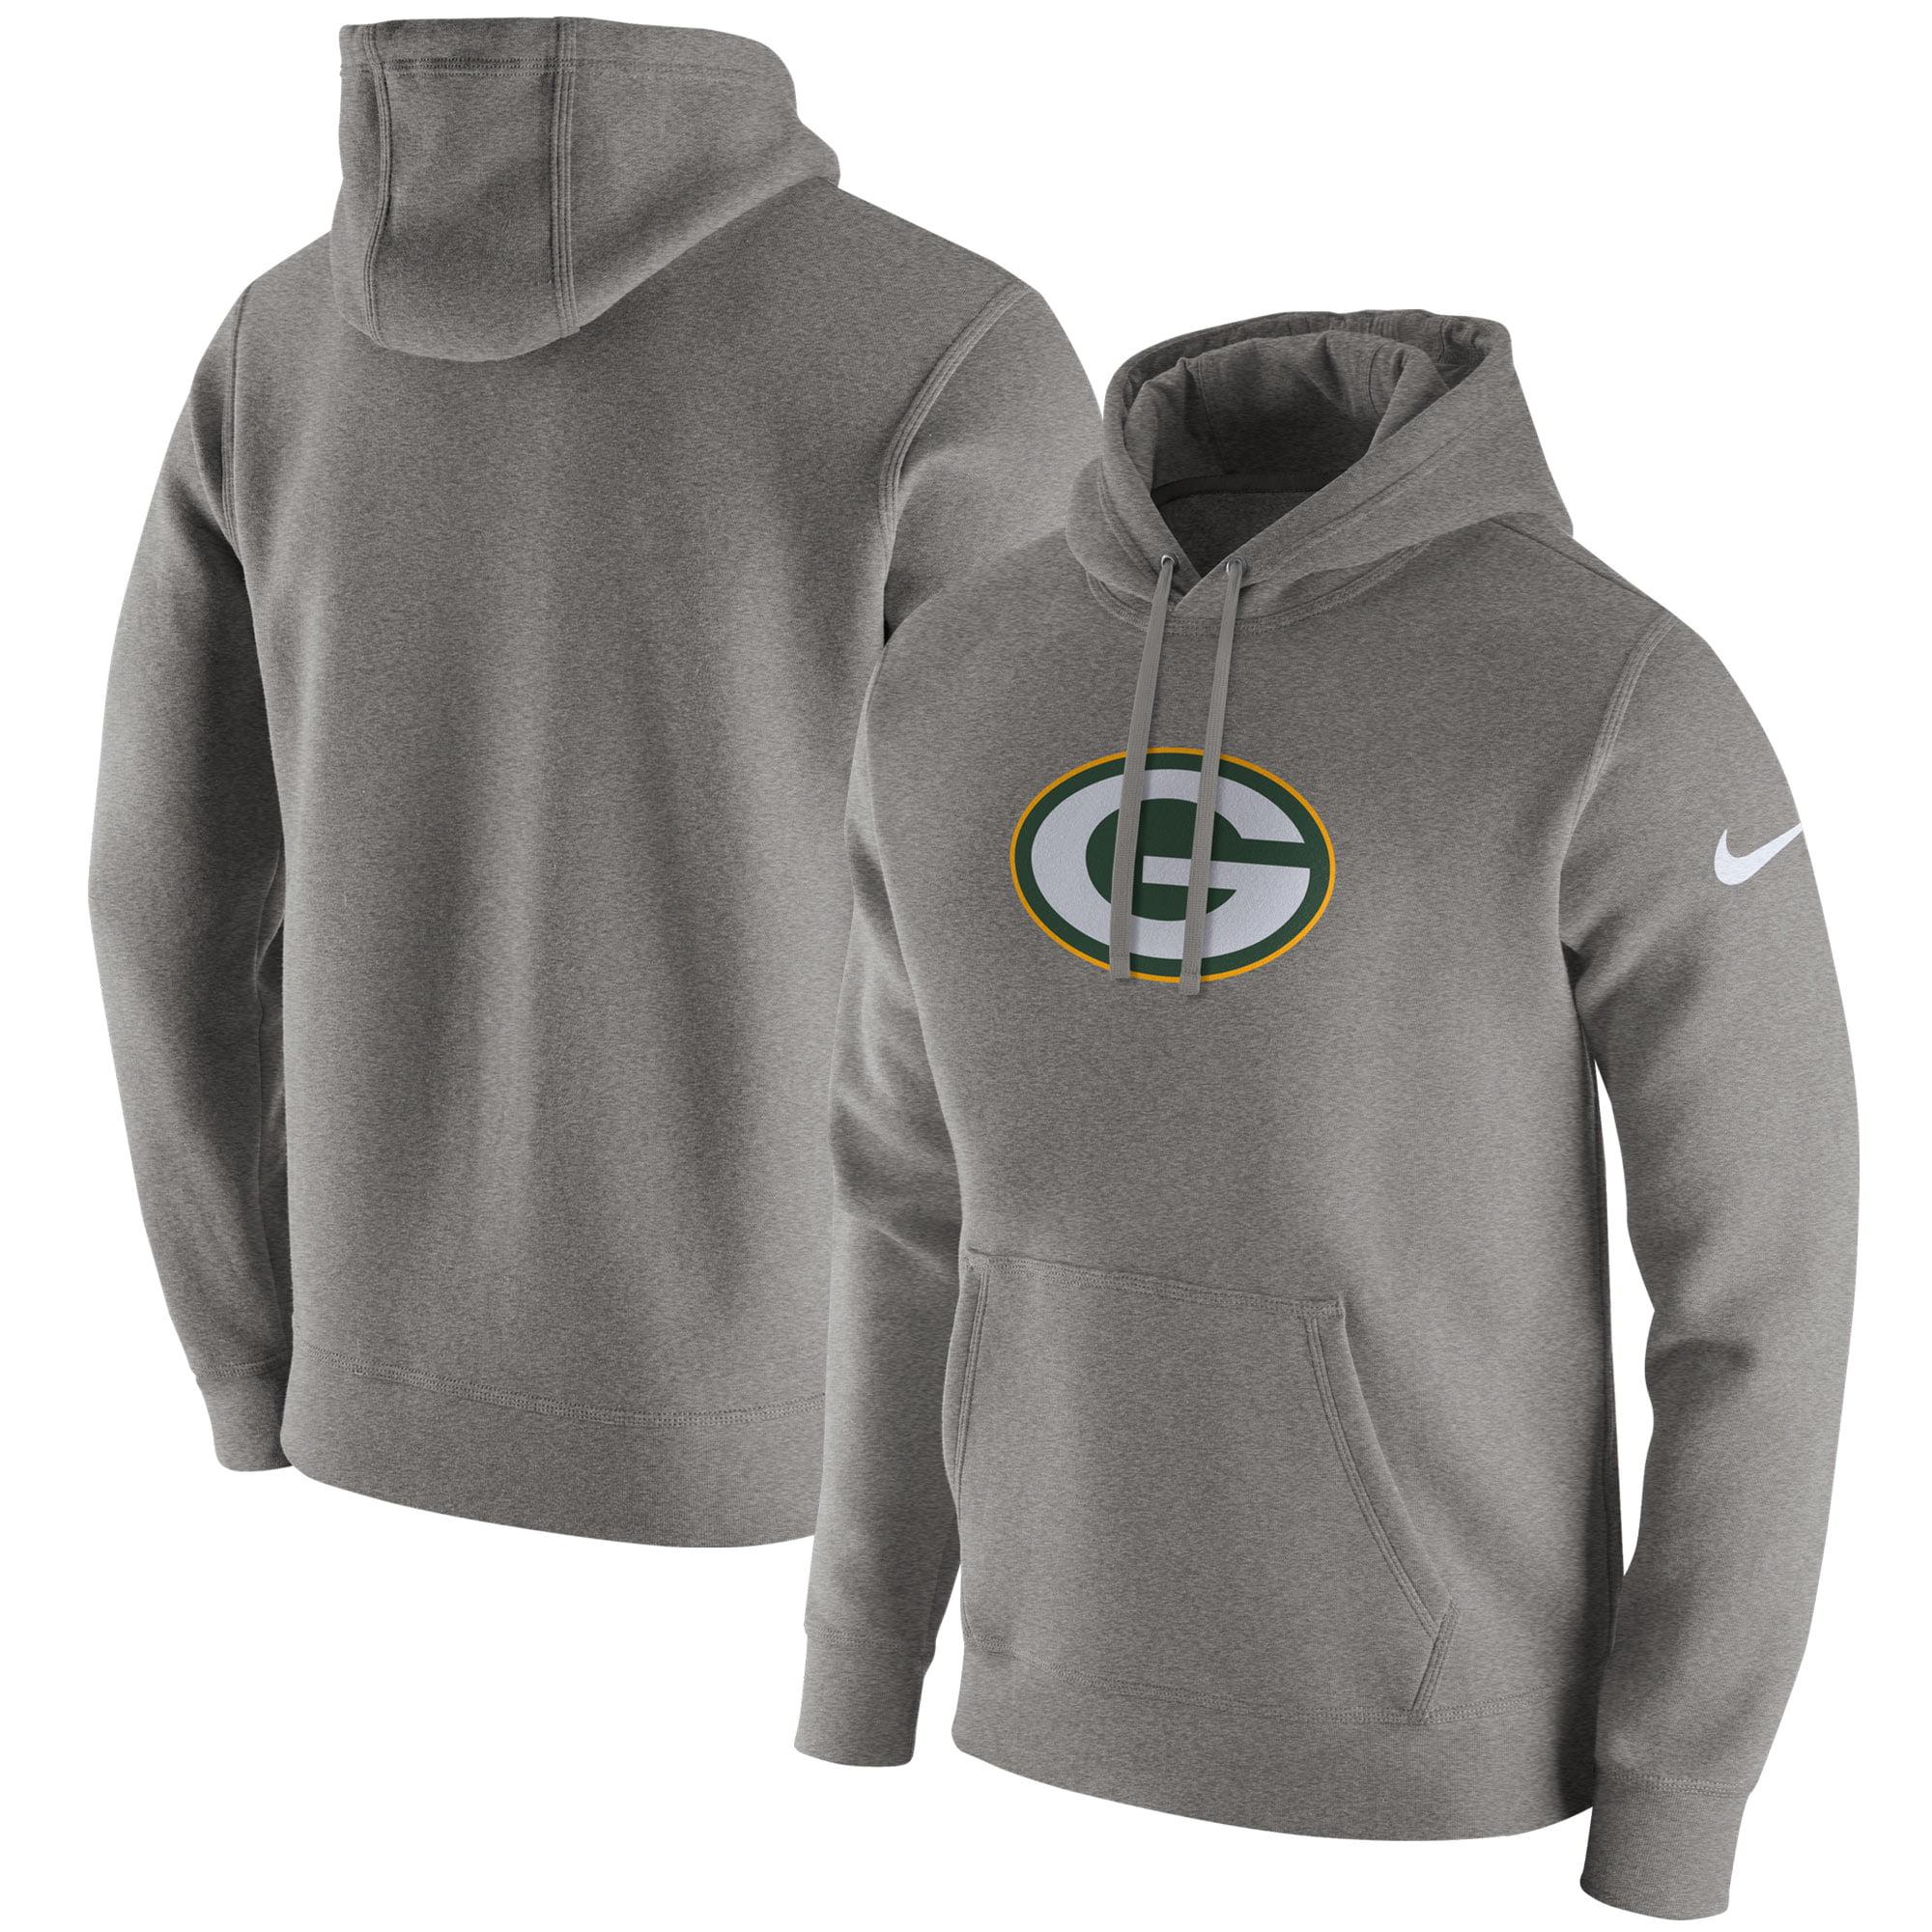 Green Bay Packers Nike Club Fleece Pullover Hoodie - Heathered Gray